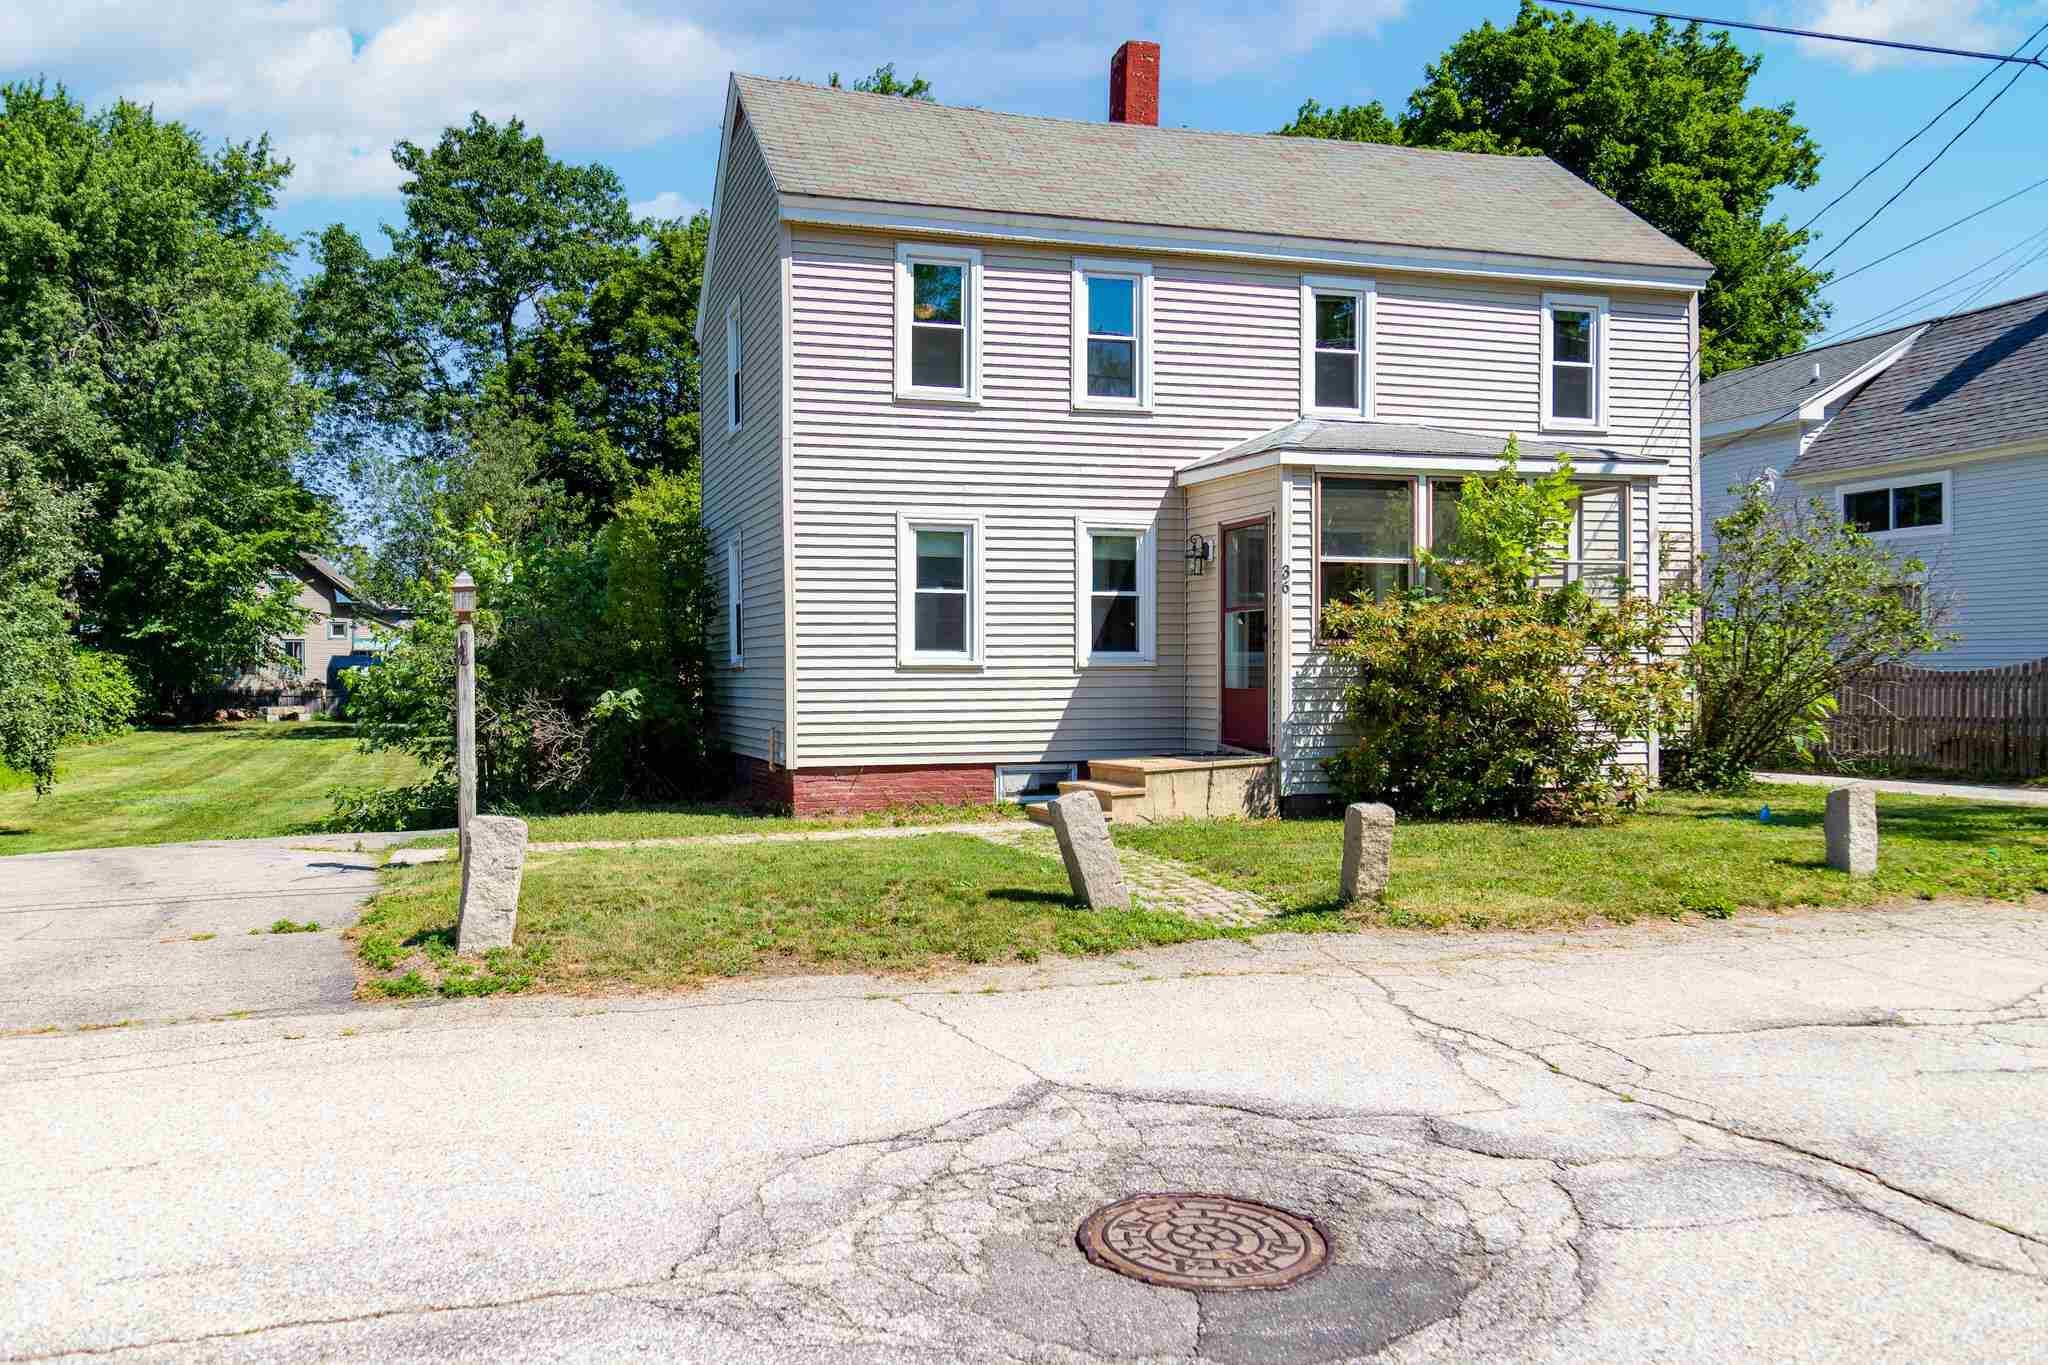 36 Stone Street, Concord, NH 03301